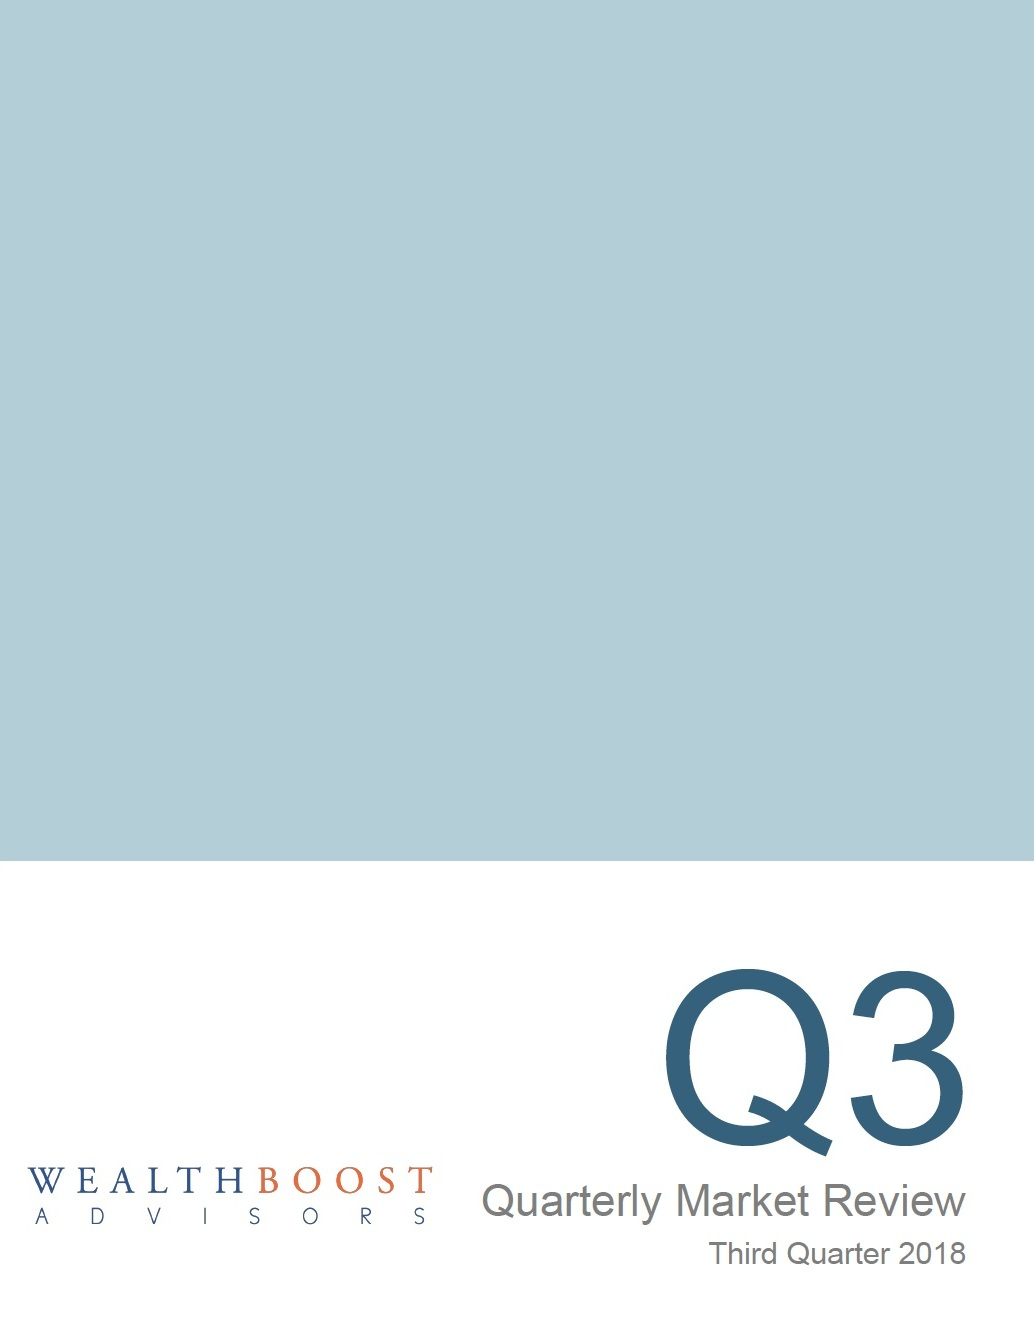 2018 Q3 Quarterly Market Review .jpg